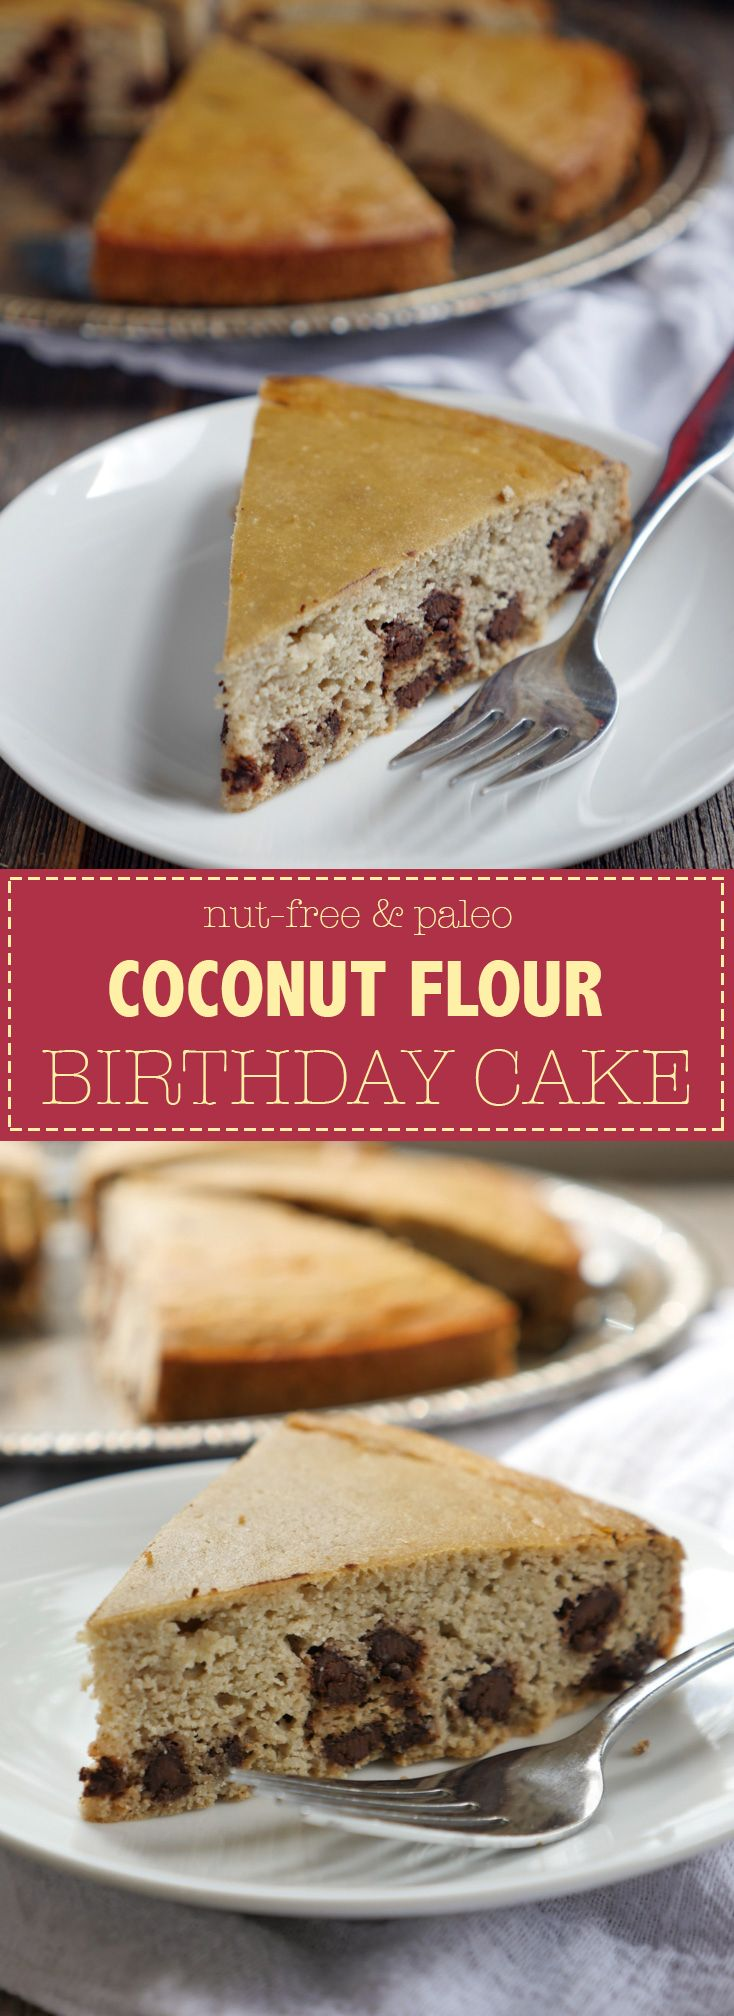 Easy Coconut Flour Birthday Cake - paleo and nut-free. Recipe by Ashley of MyHeartBeets.com